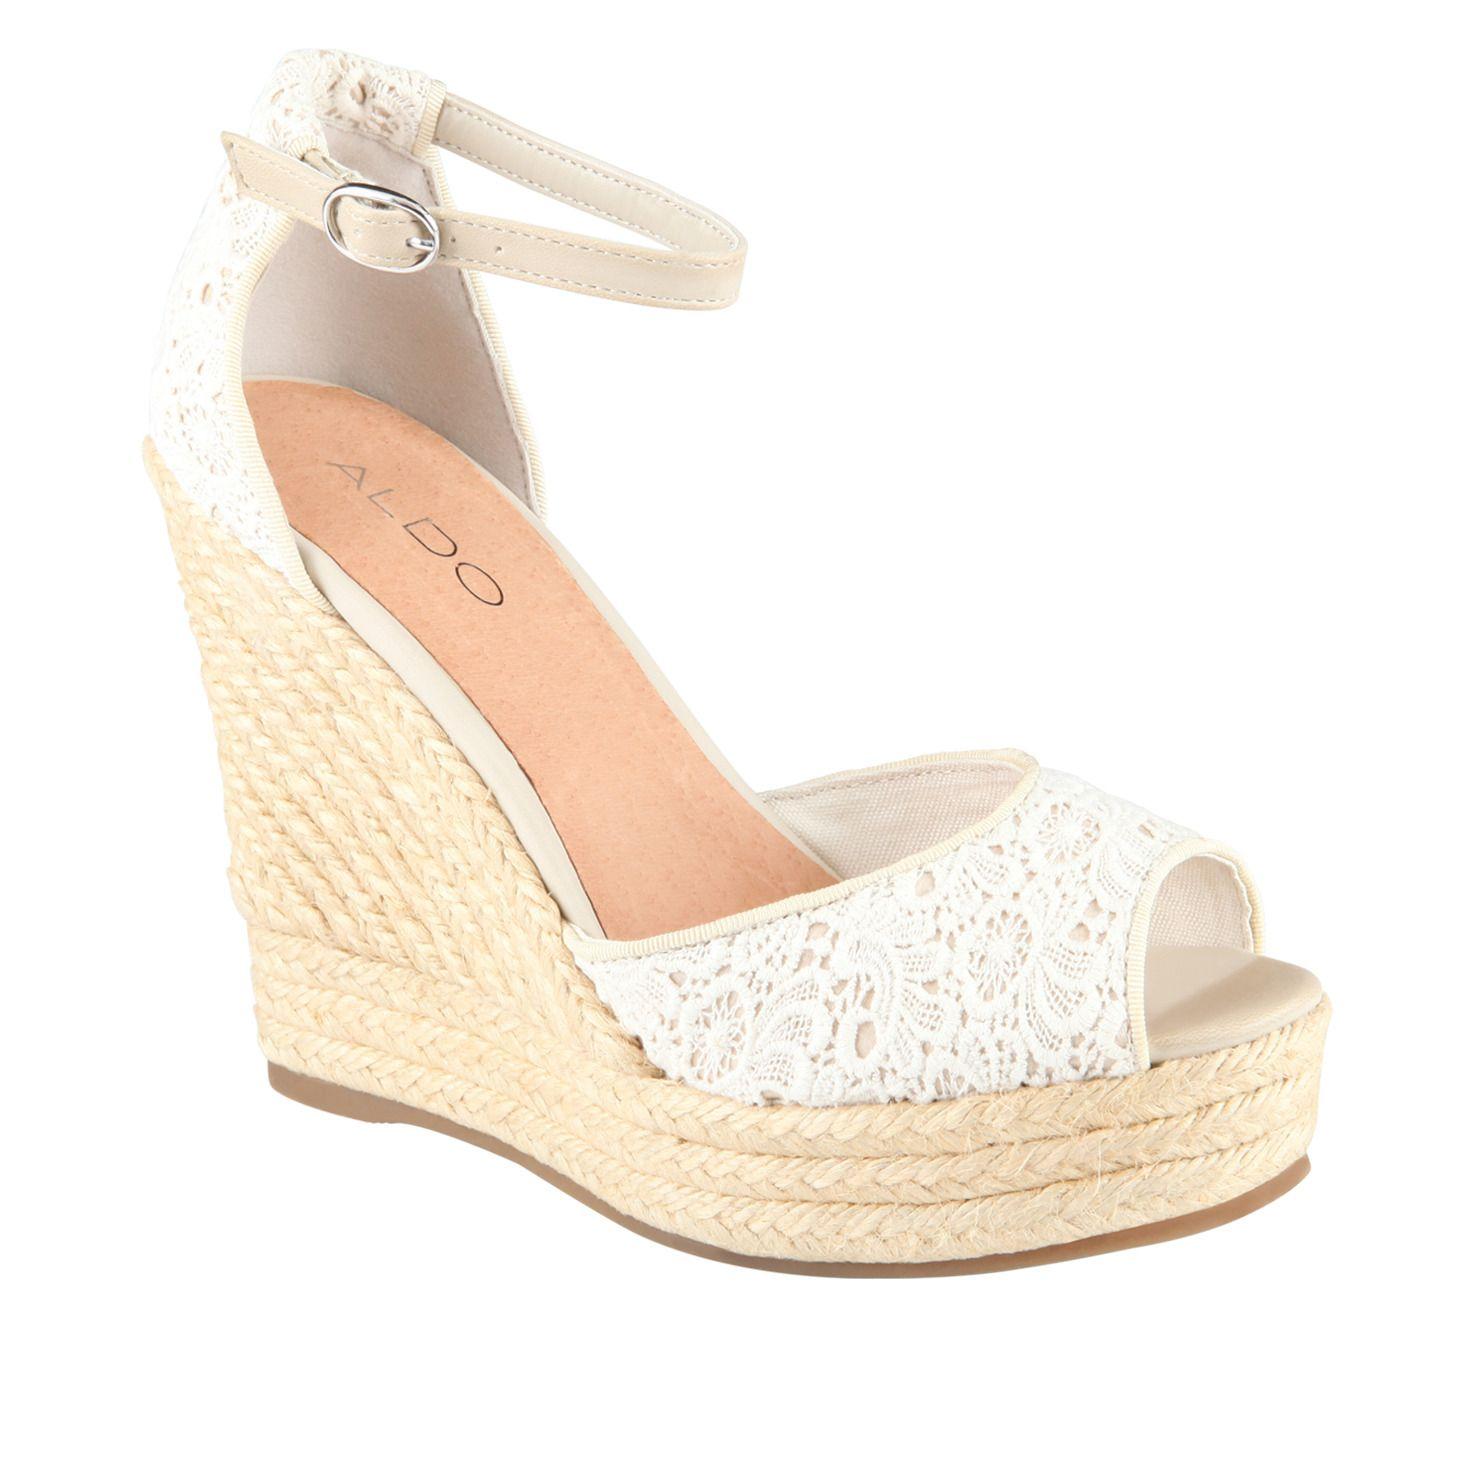 Lovin Women S Wedges Sandals For Sale At Aldo Shoes I Want Womens Sandals Wedges Wedding Shoes Platform Lace Wedges